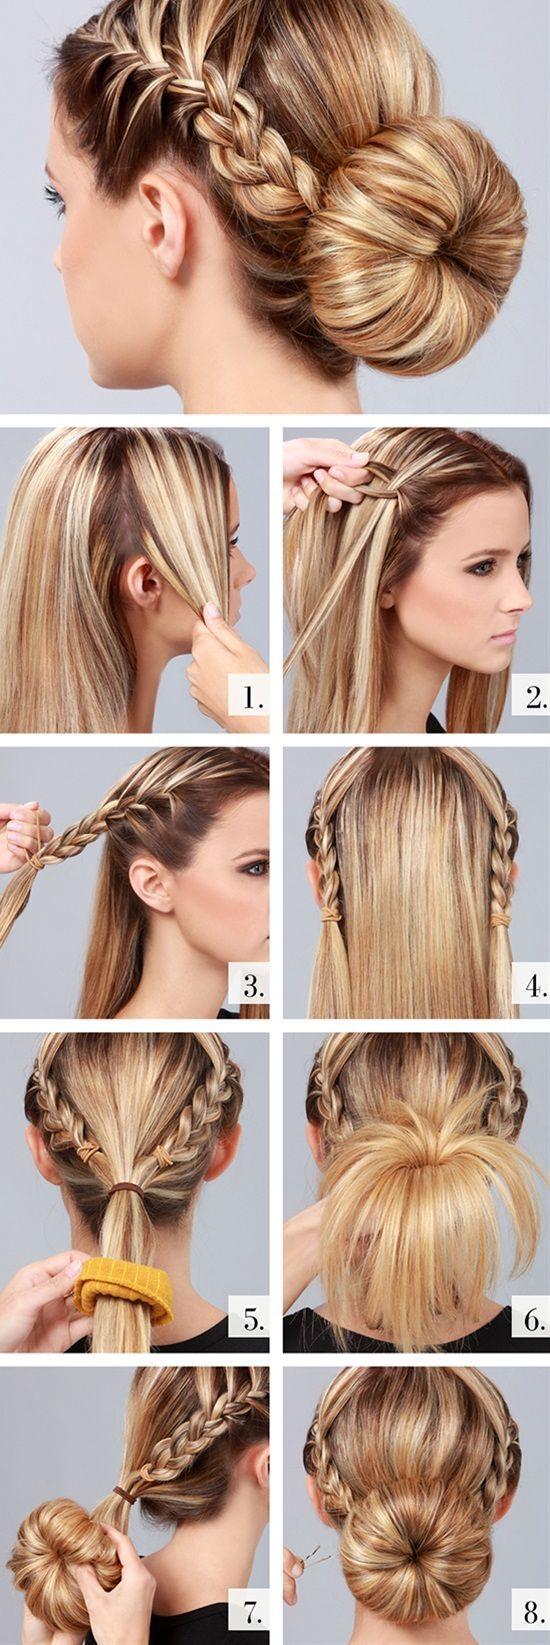 16 Easy Updo Hair Tutorials for the Season - Pretty Designs